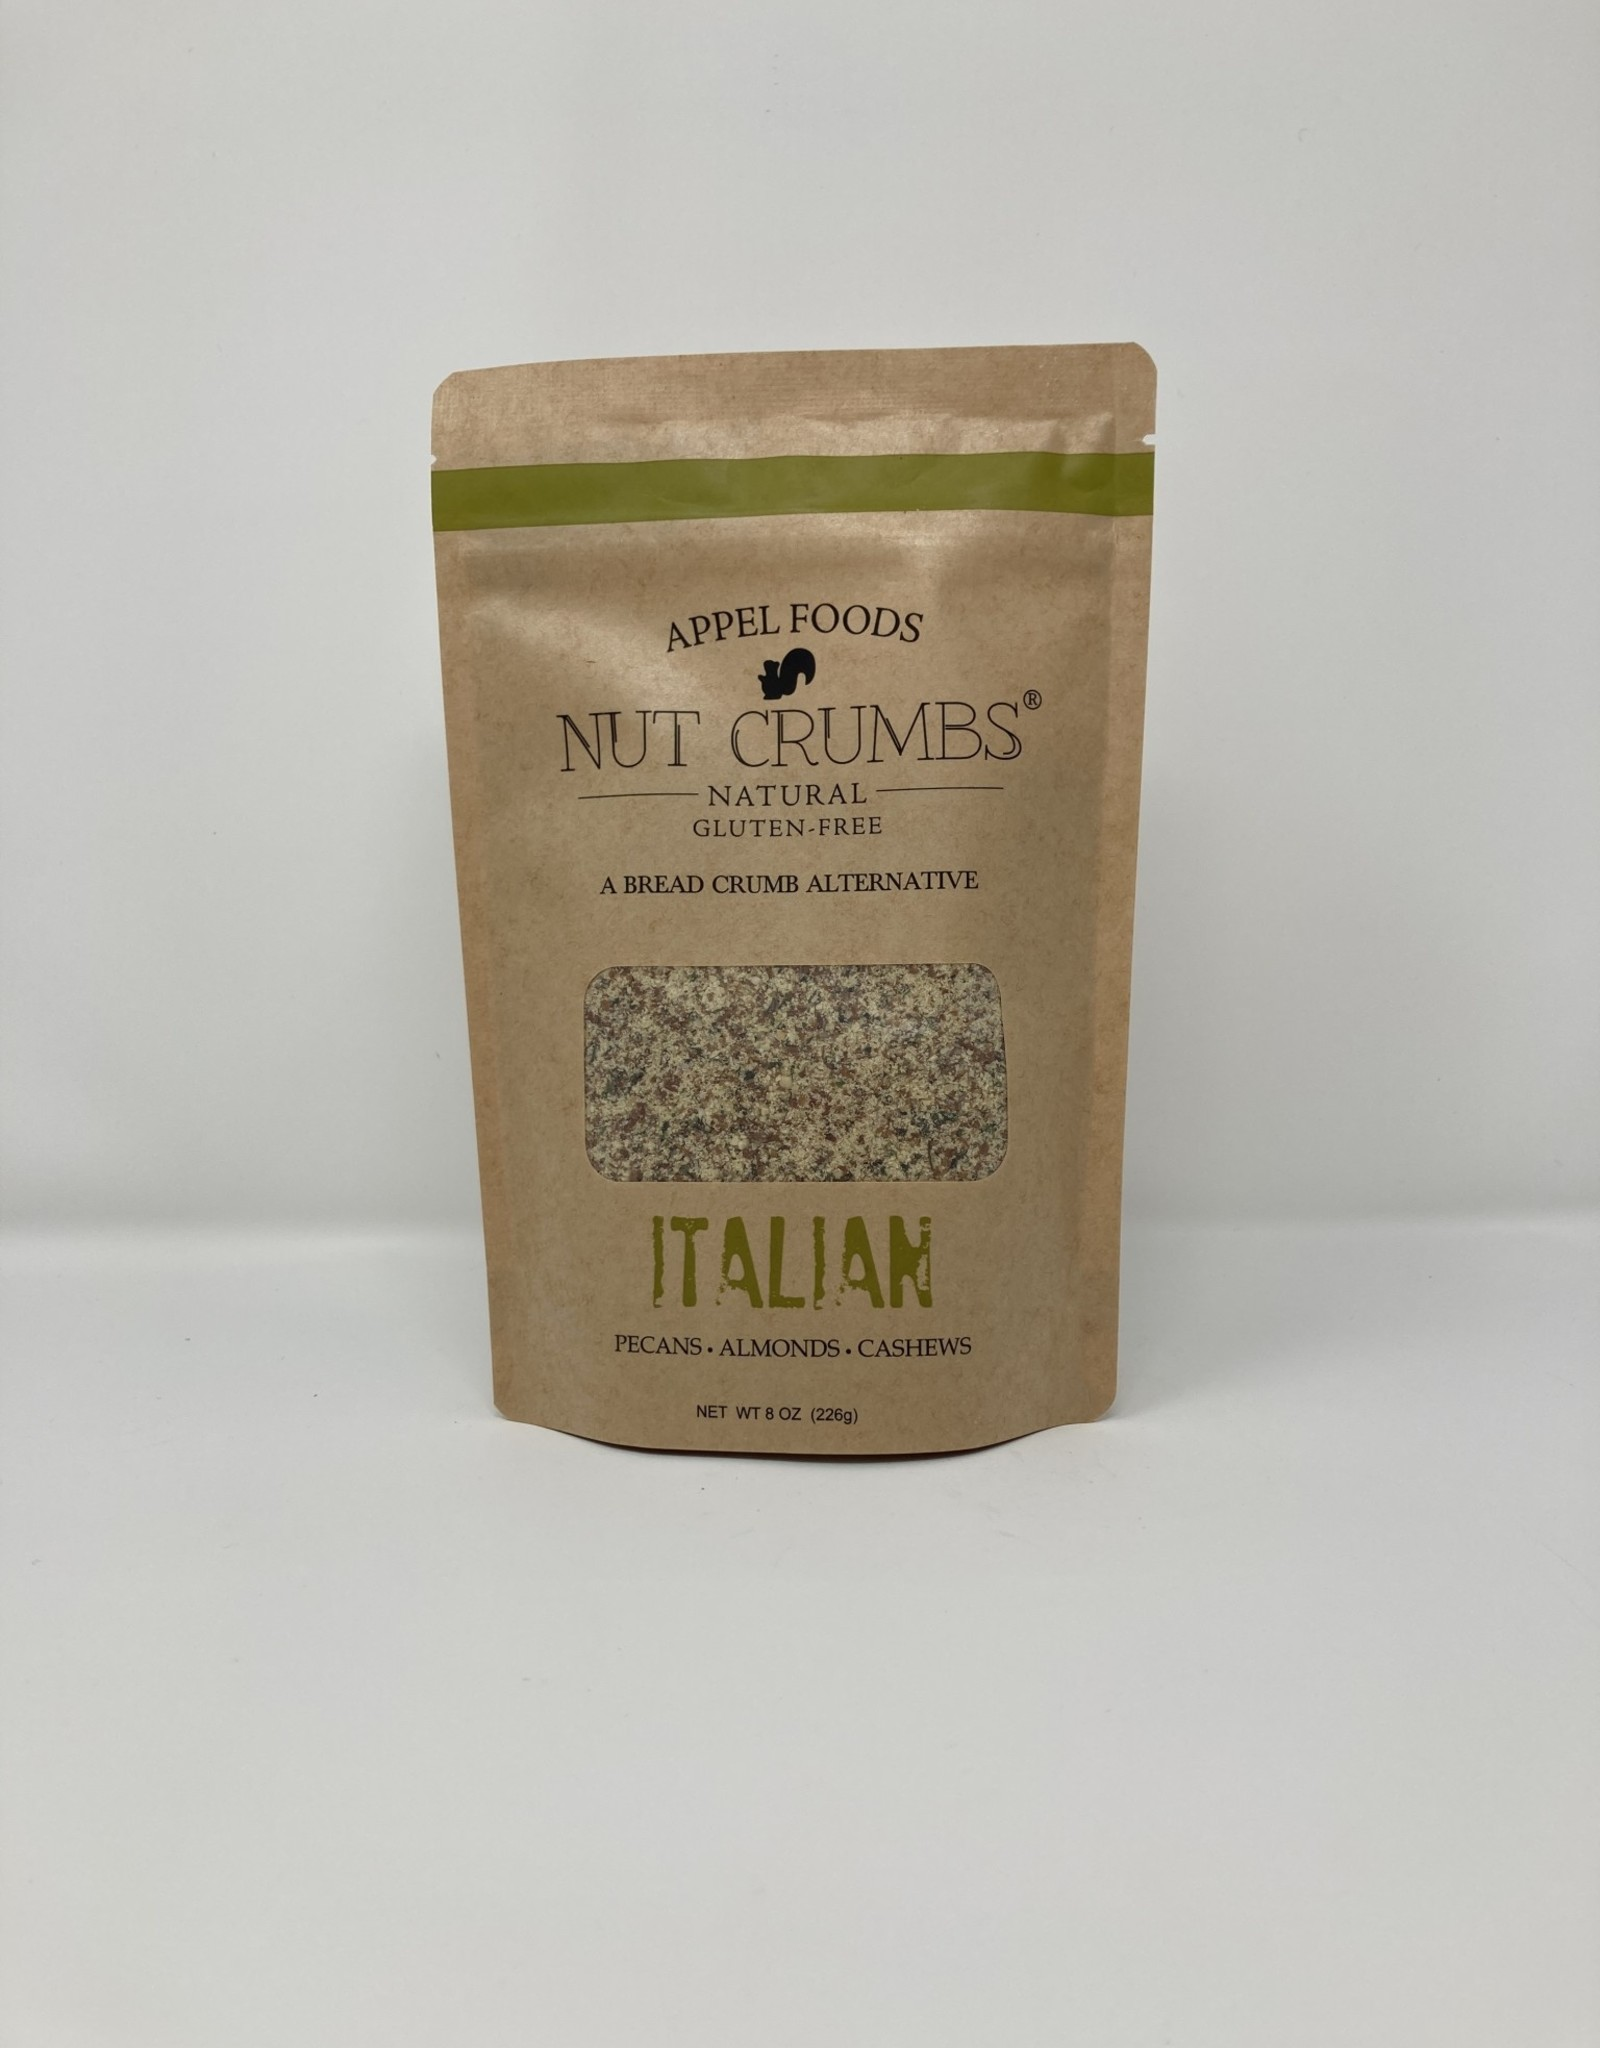 Nut Crumbs Nut Crumbs - Bread Crumb Alternative, Italian